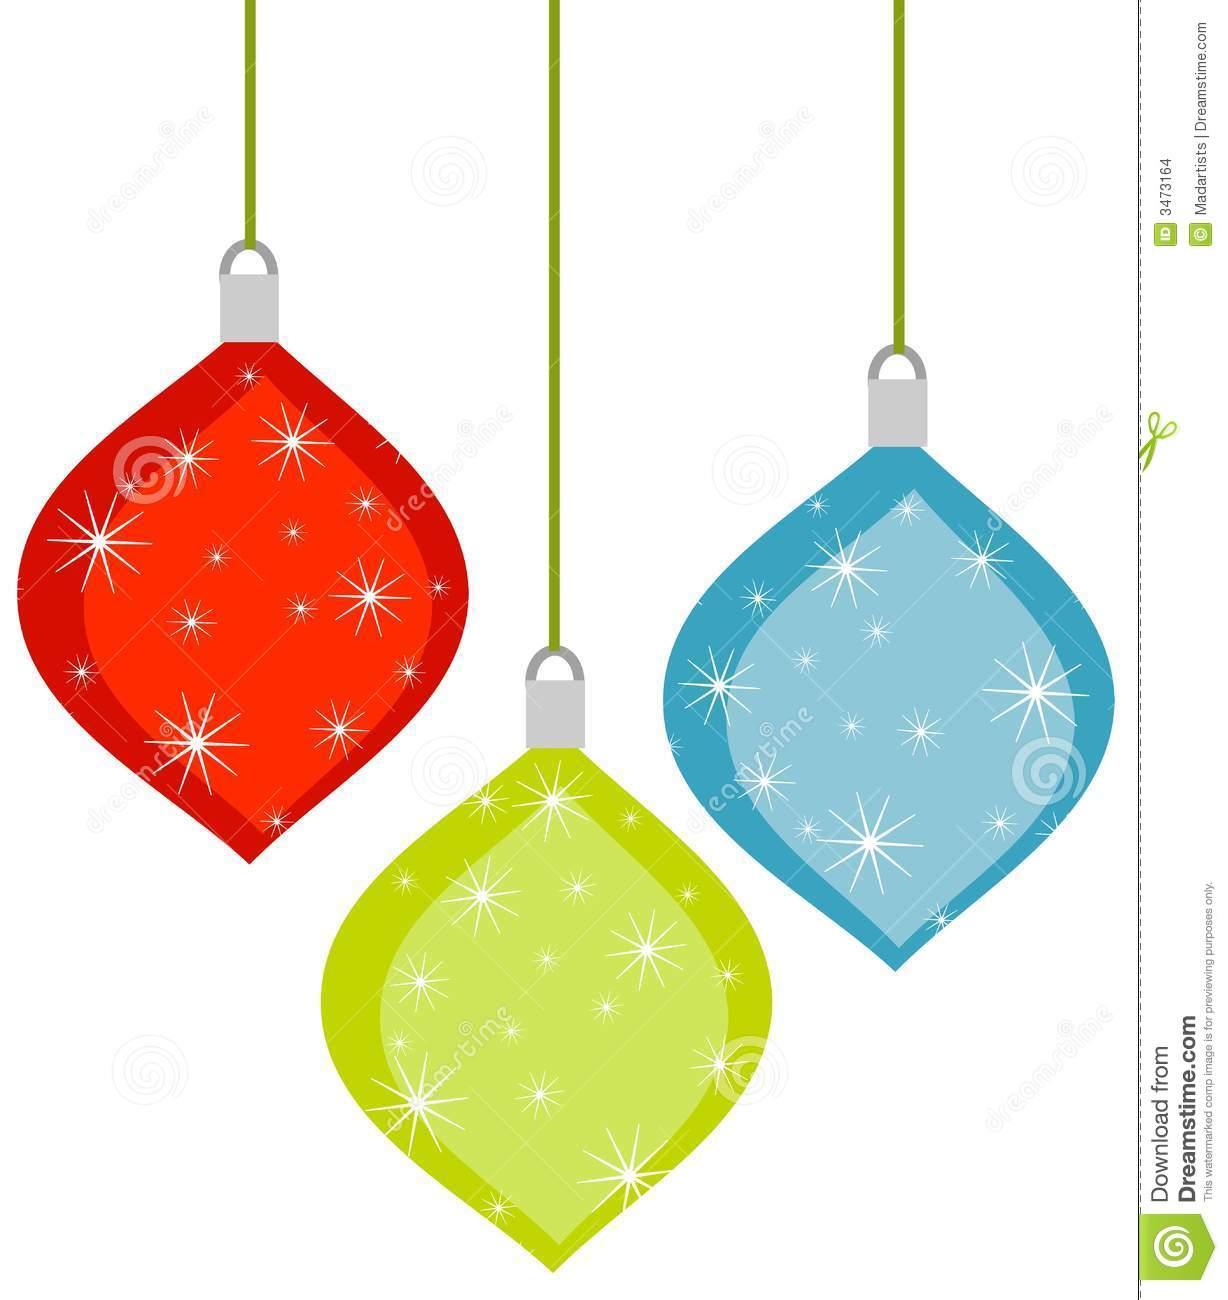 Christmas Tree Ornament Clipart.